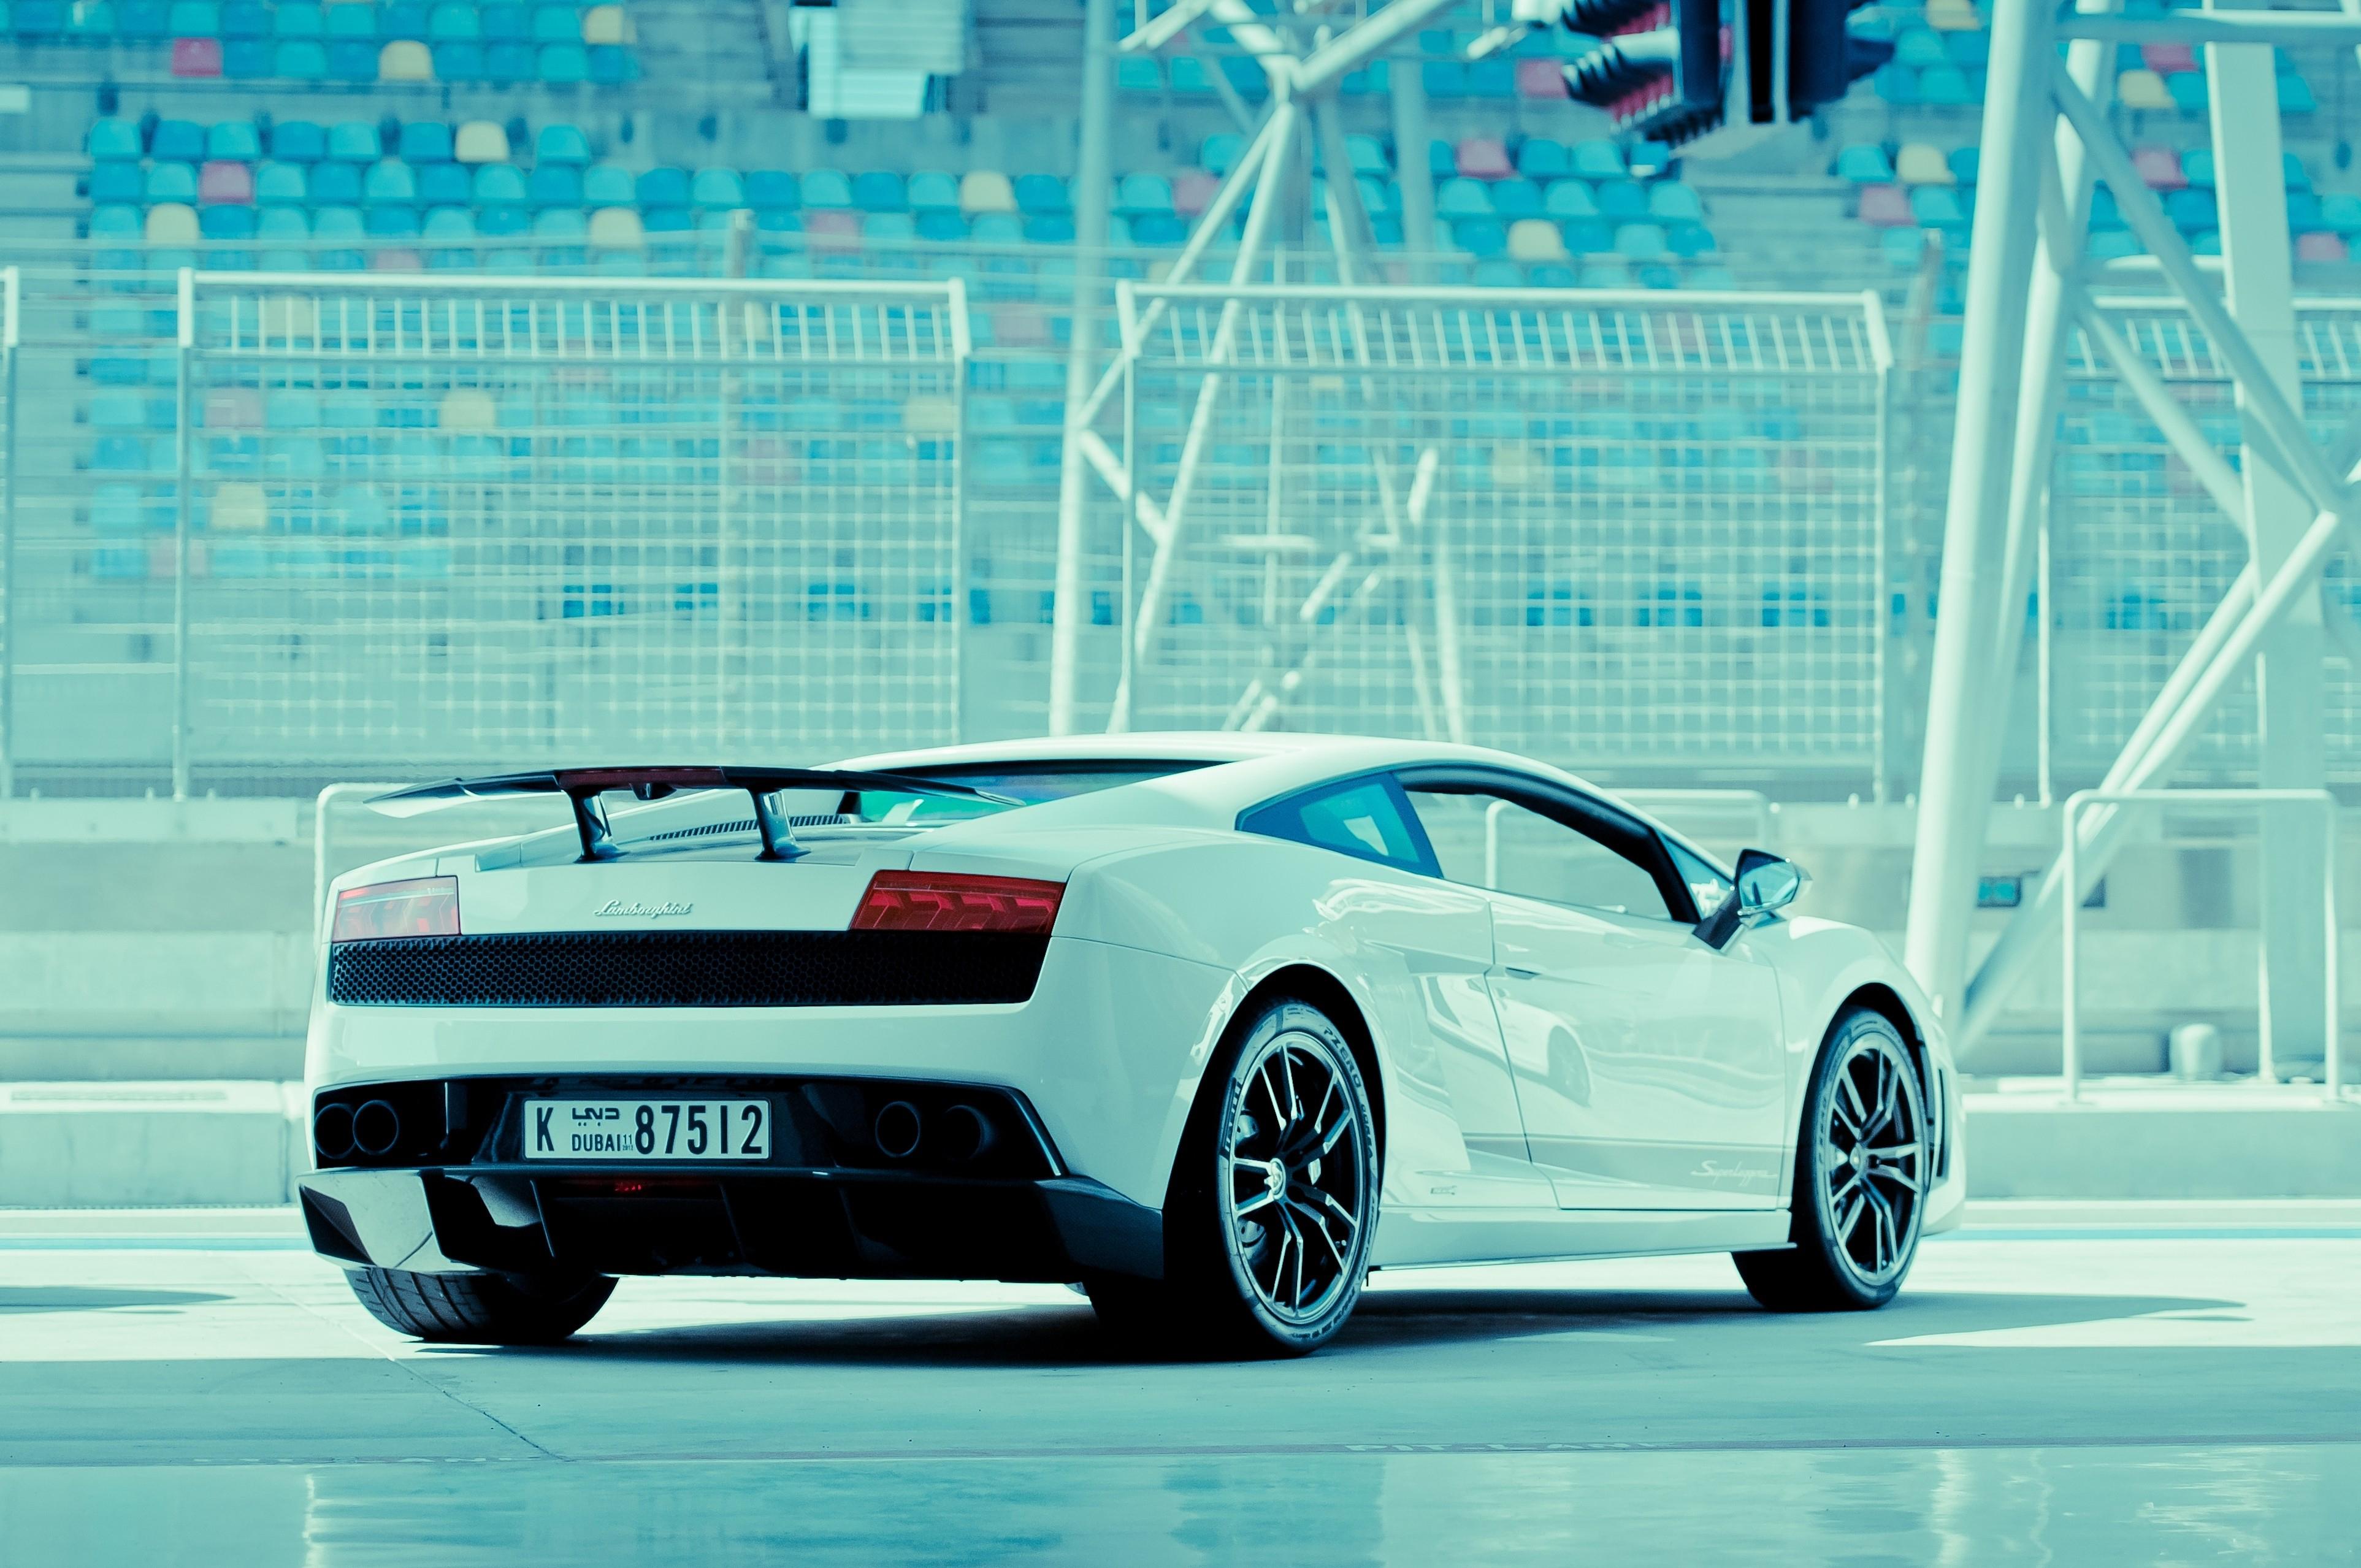 Lamborghini en Dubai - 3850x2557